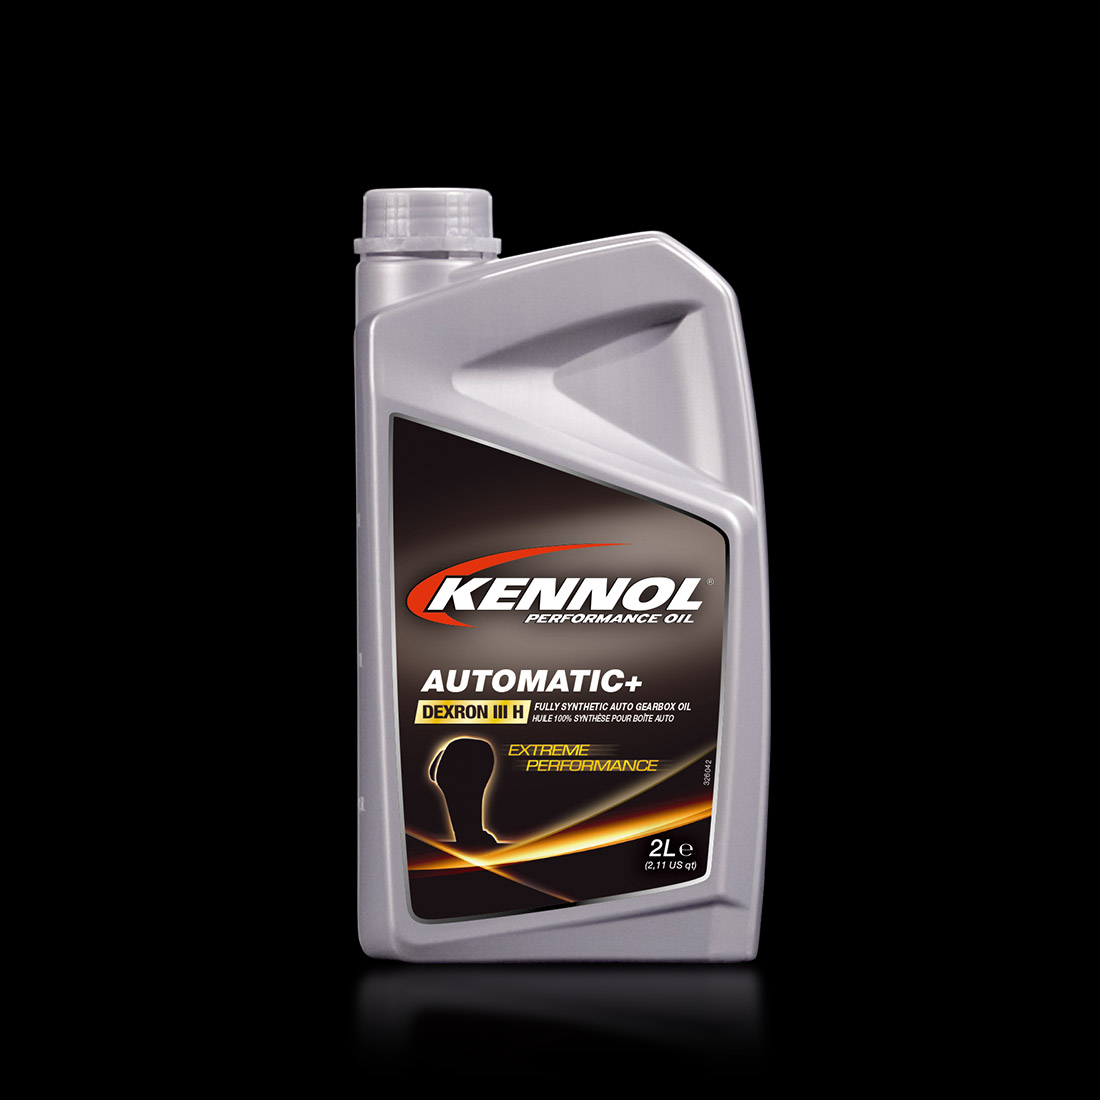 AUTOMATIC+ DEXRON III H   KENNOL - Performance Oil